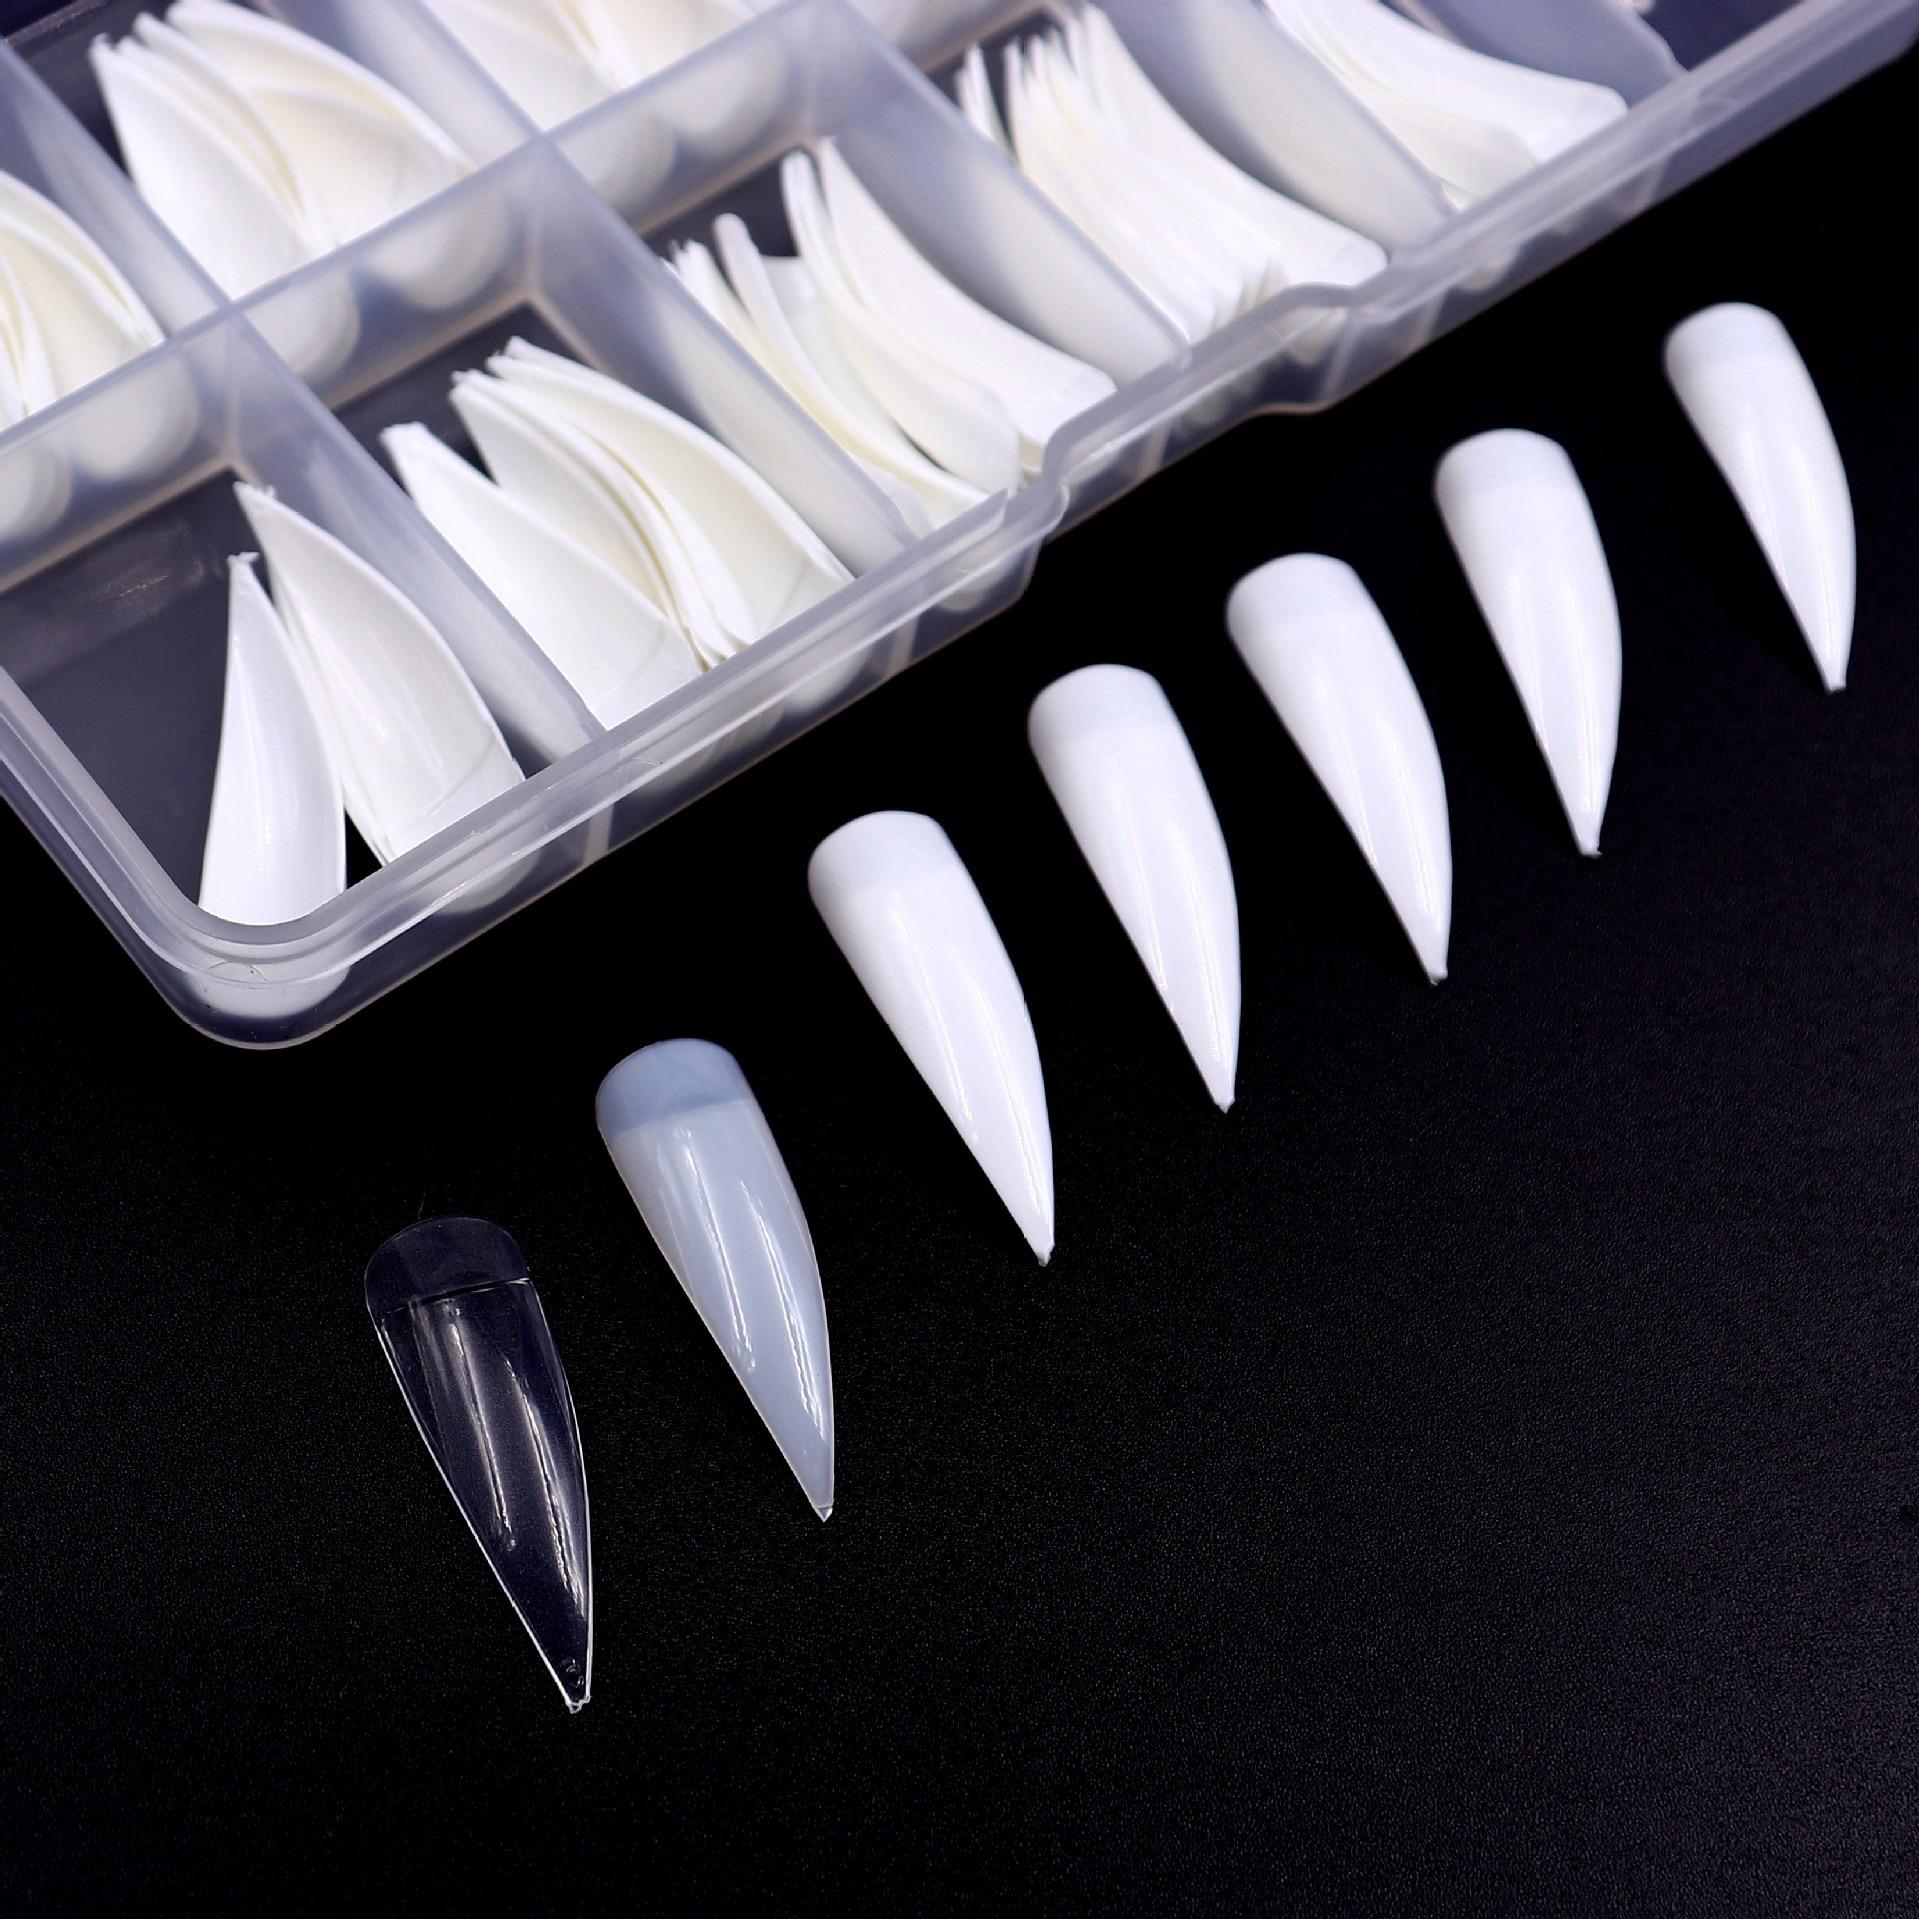 500 PCs OPP Bag Manicure Salon Pointed-Toe Long Nail Tip DIY Fake Nails Patch Art Nail Tip